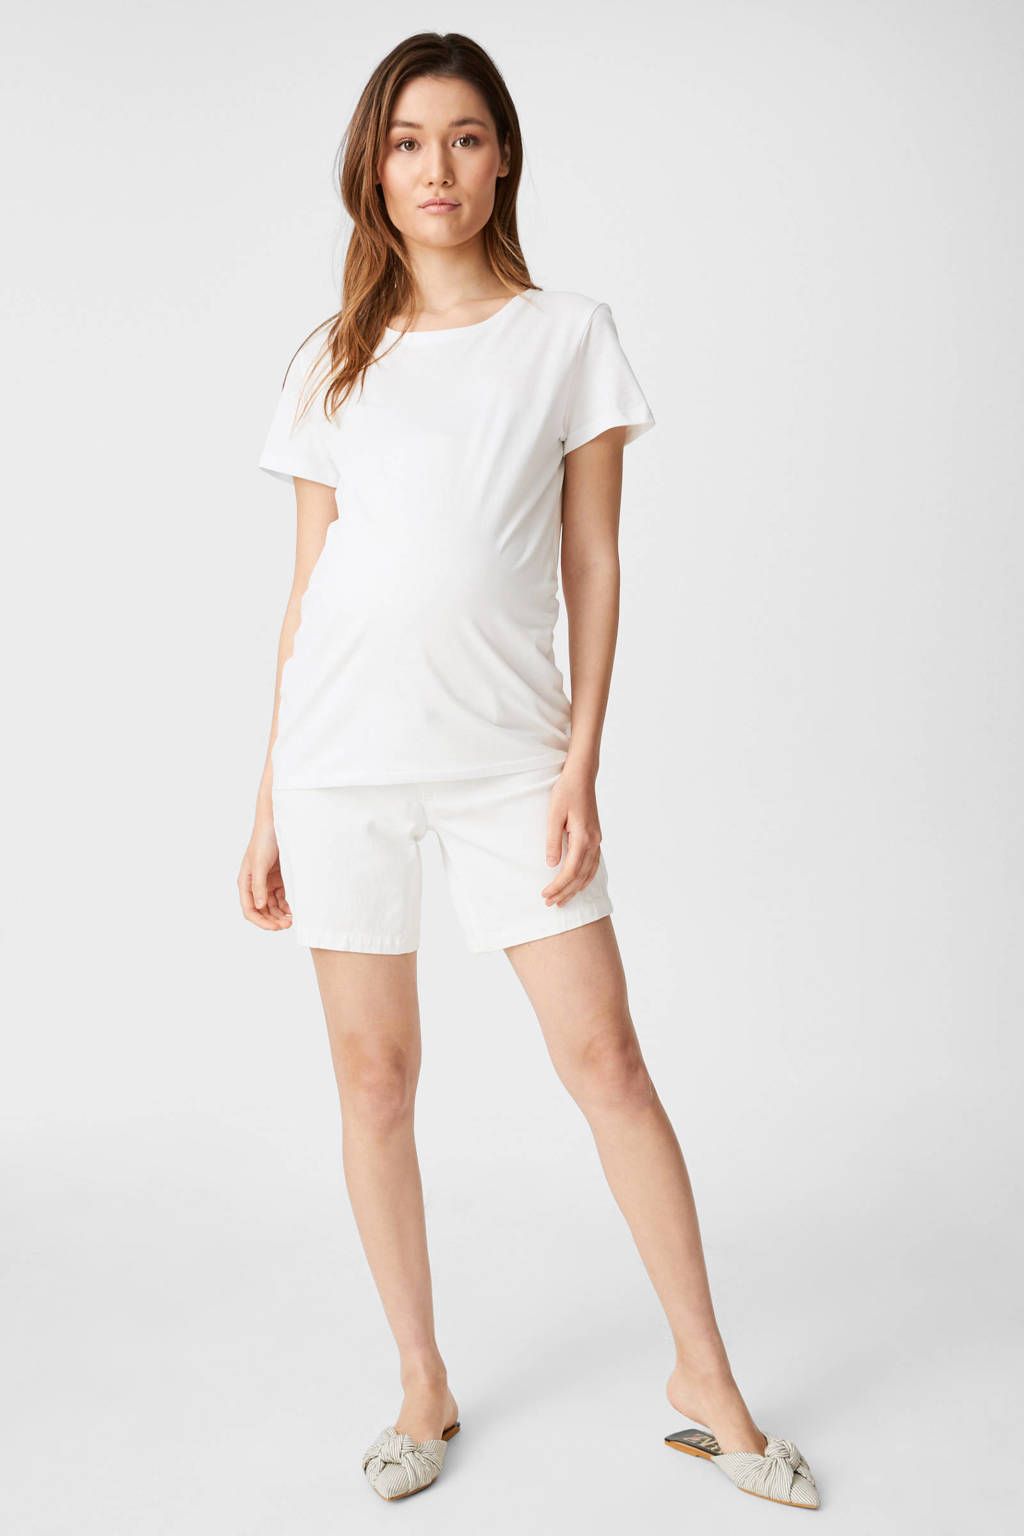 C&A Yessica zwangershapsshirt - set van 2 zwart/wit, Zwart/wit